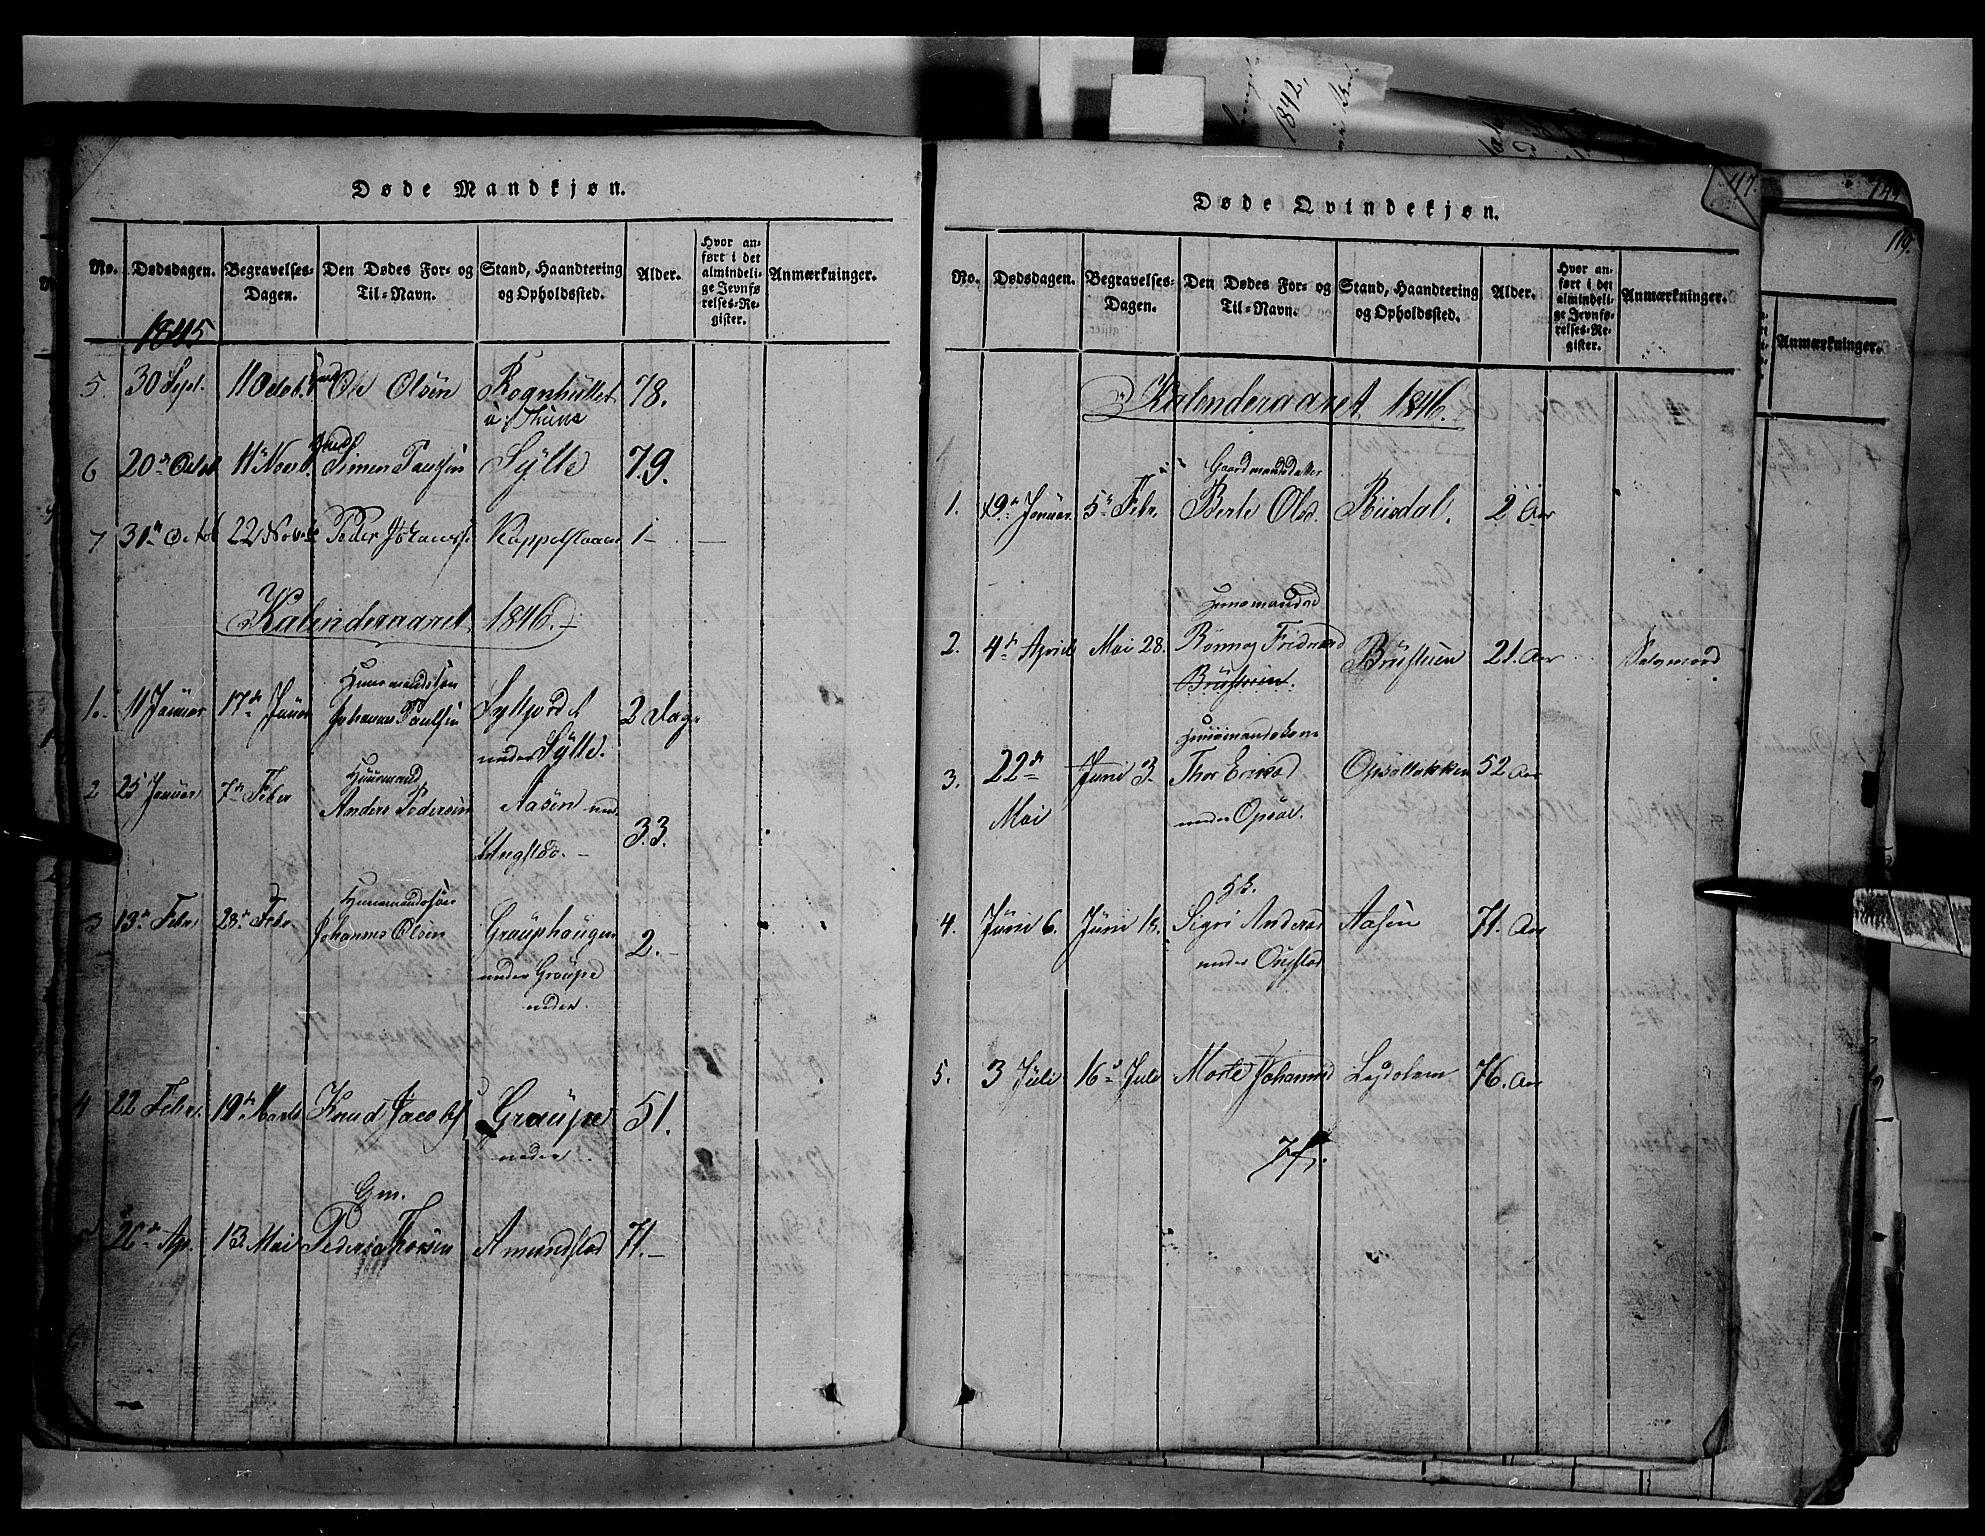 SAH, Fron prestekontor, H/Ha/Hab/L0003: Klokkerbok nr. 3, 1816-1850, s. 116